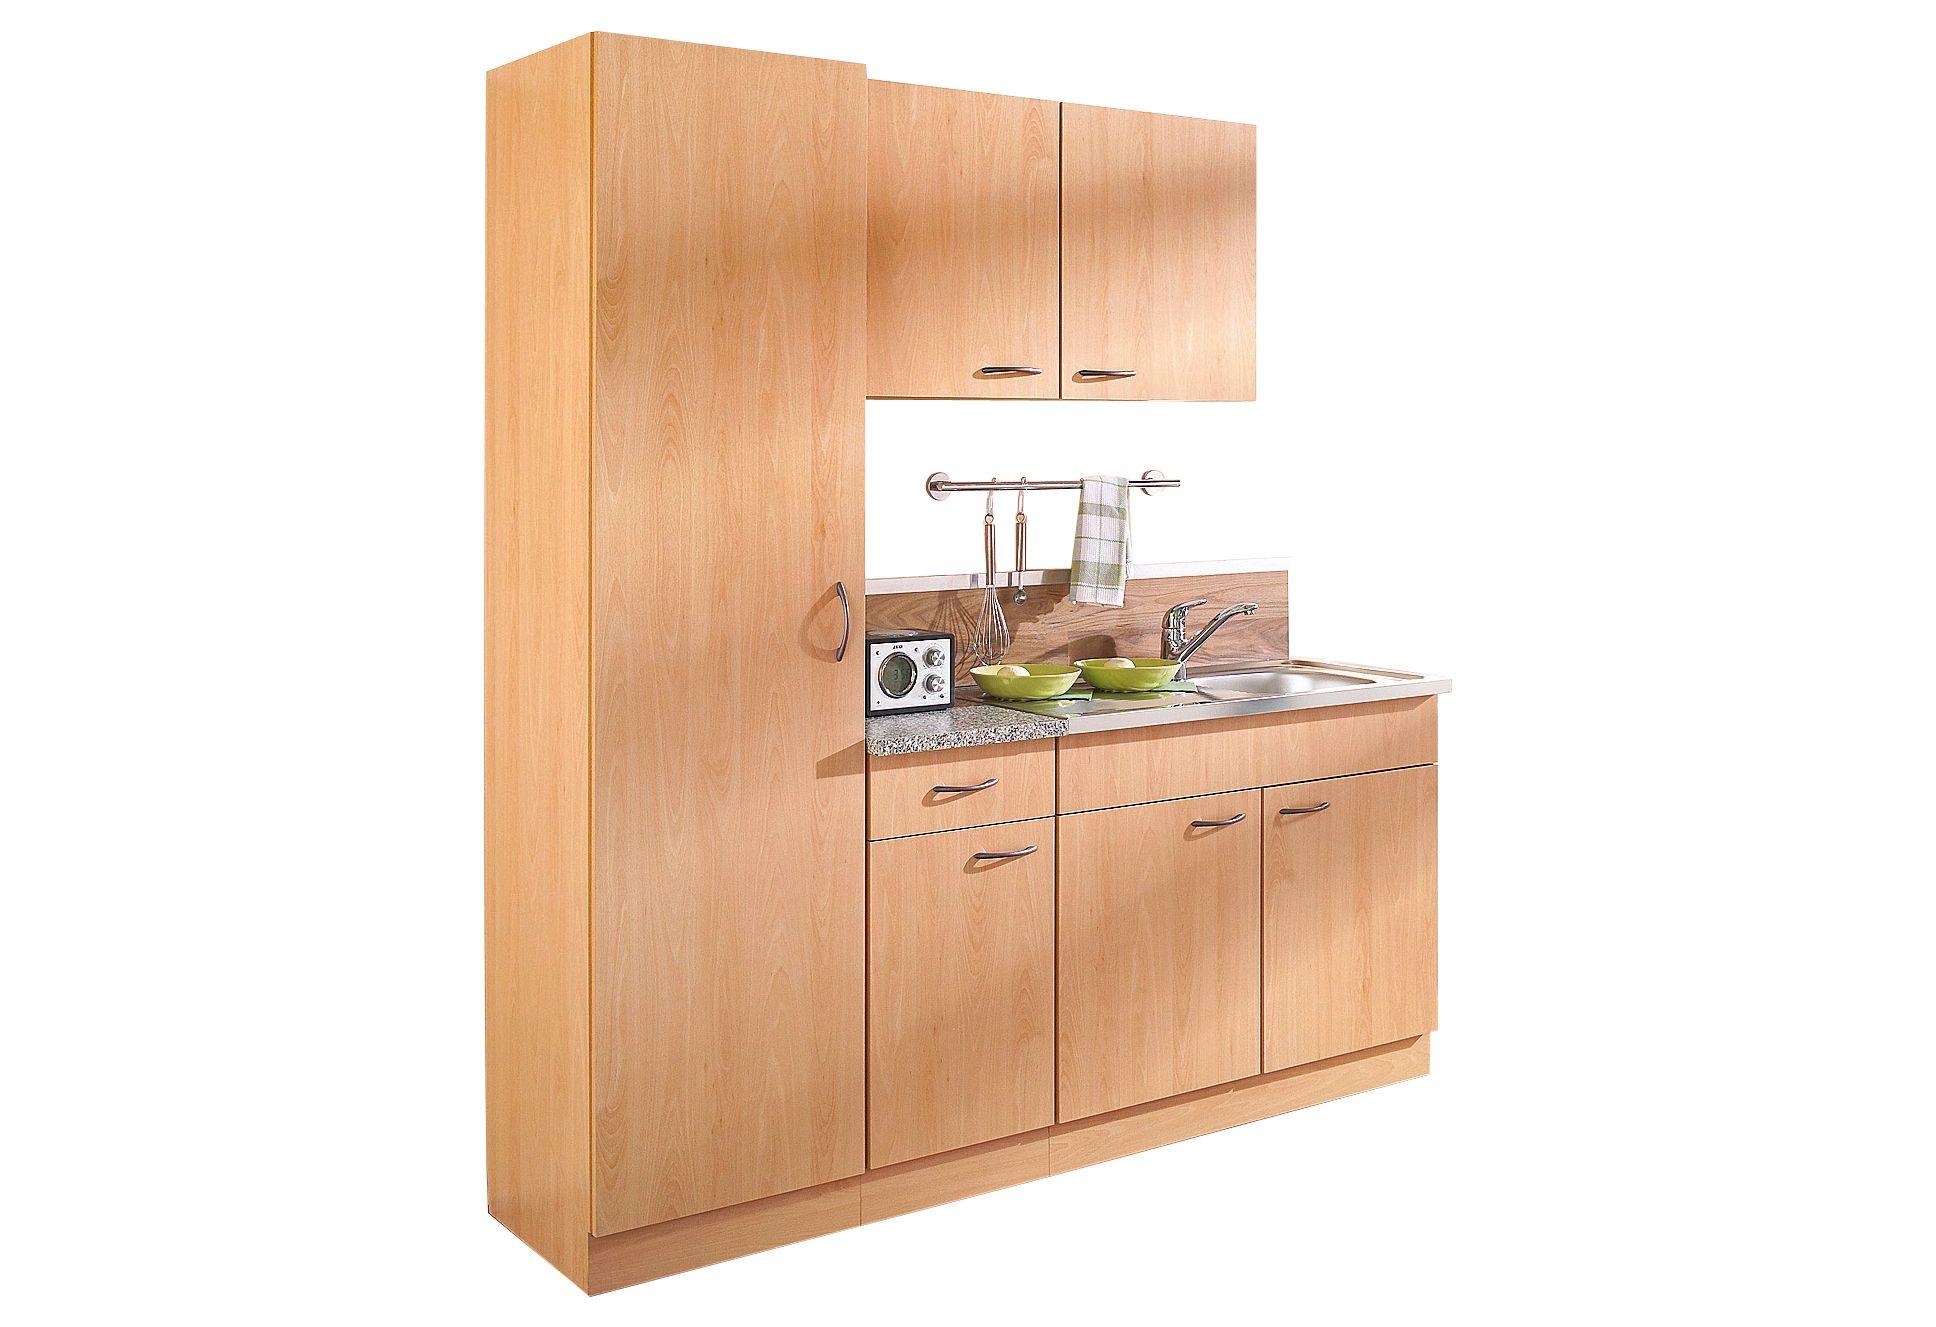 k chenblock kiel breite 190 cm schwab versand k che. Black Bedroom Furniture Sets. Home Design Ideas